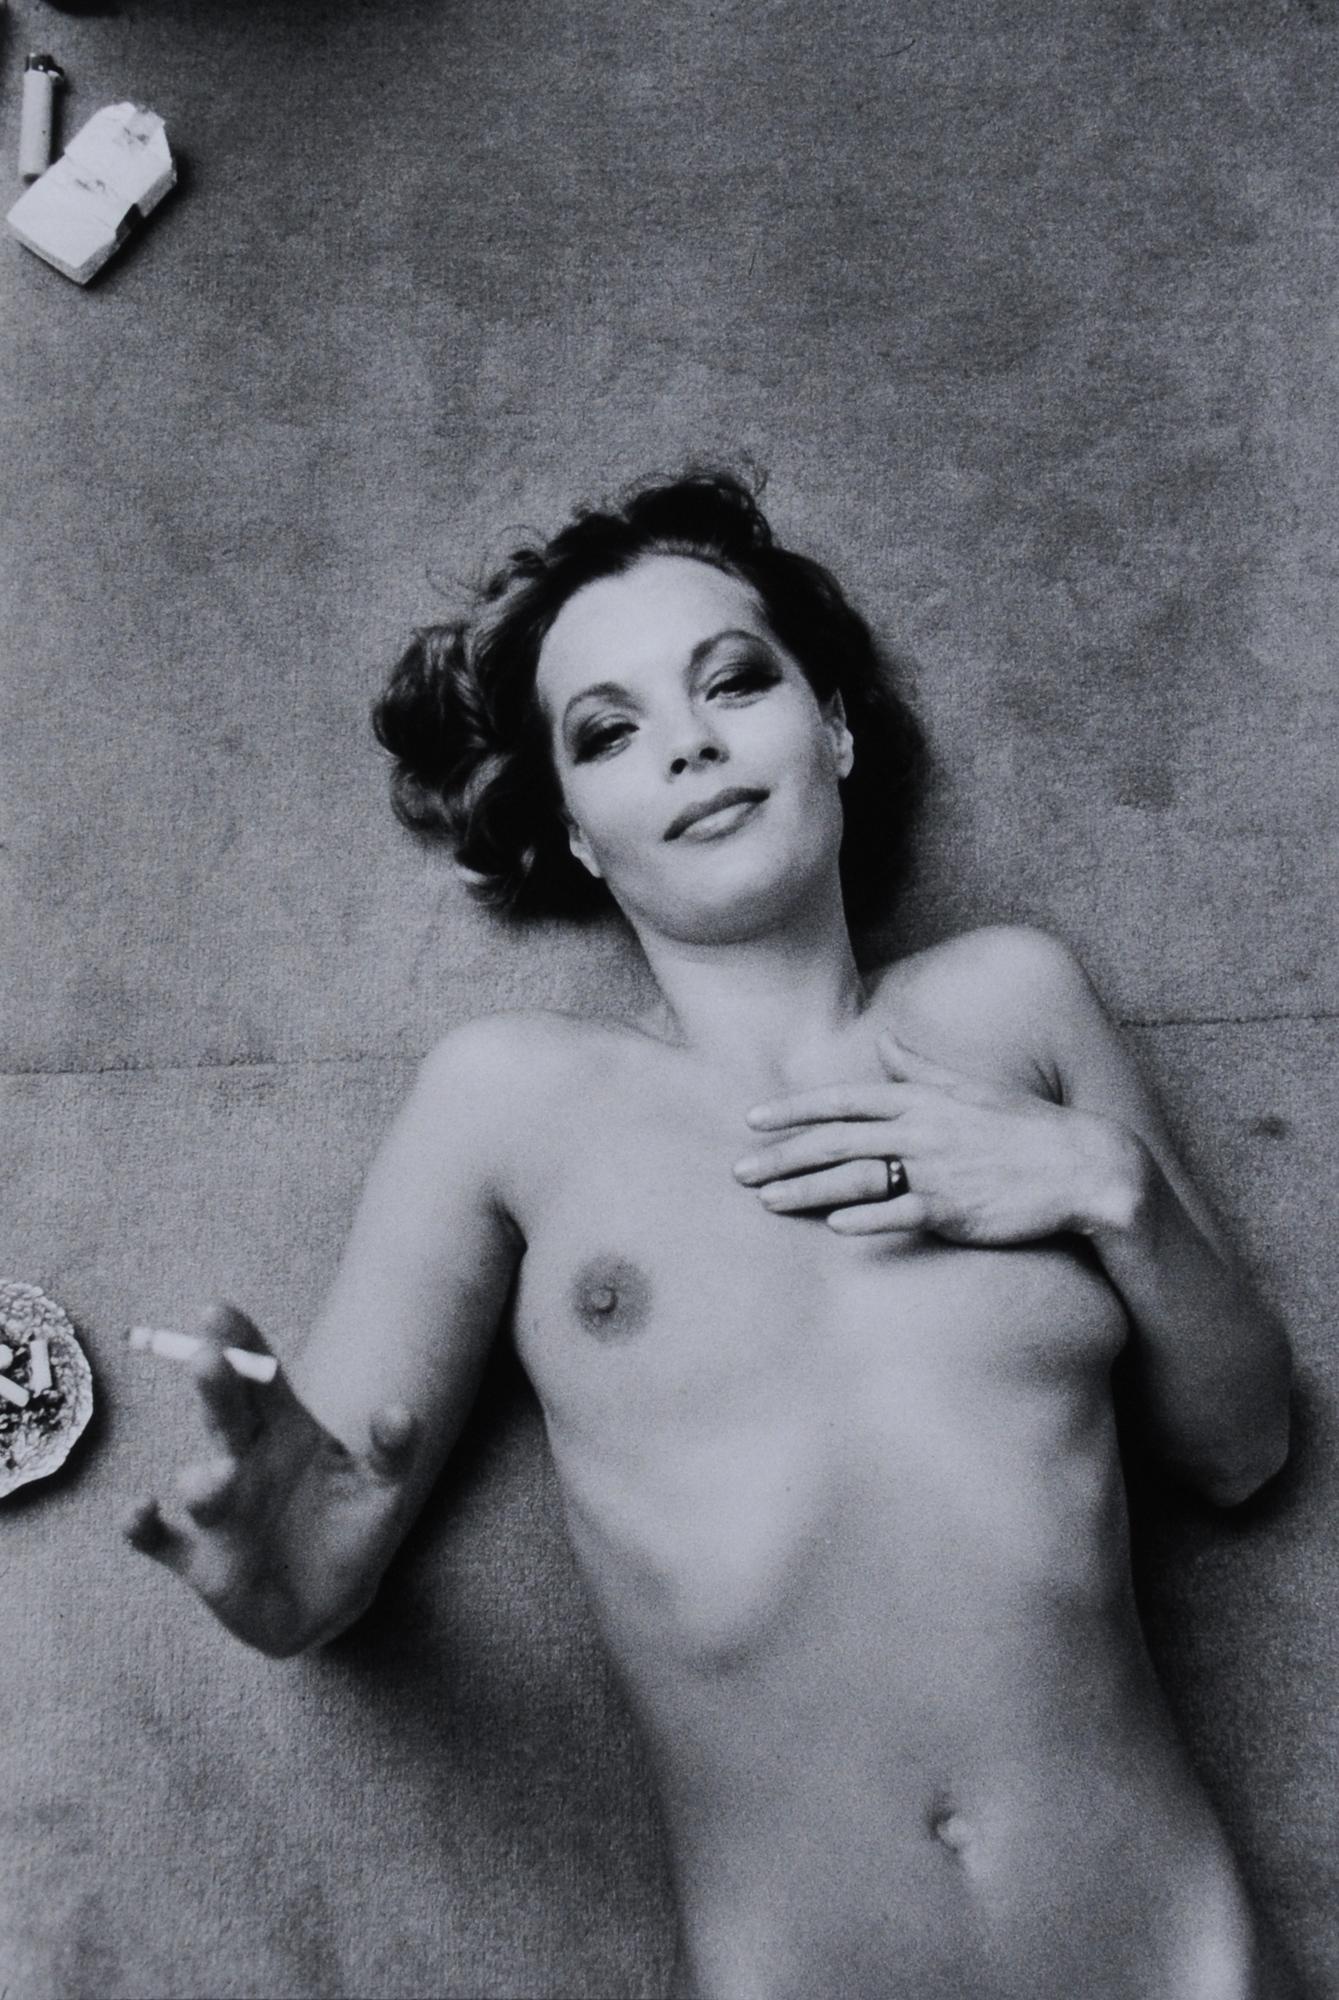 Botti Giancarlo, Romy Schneider, Paris 1974